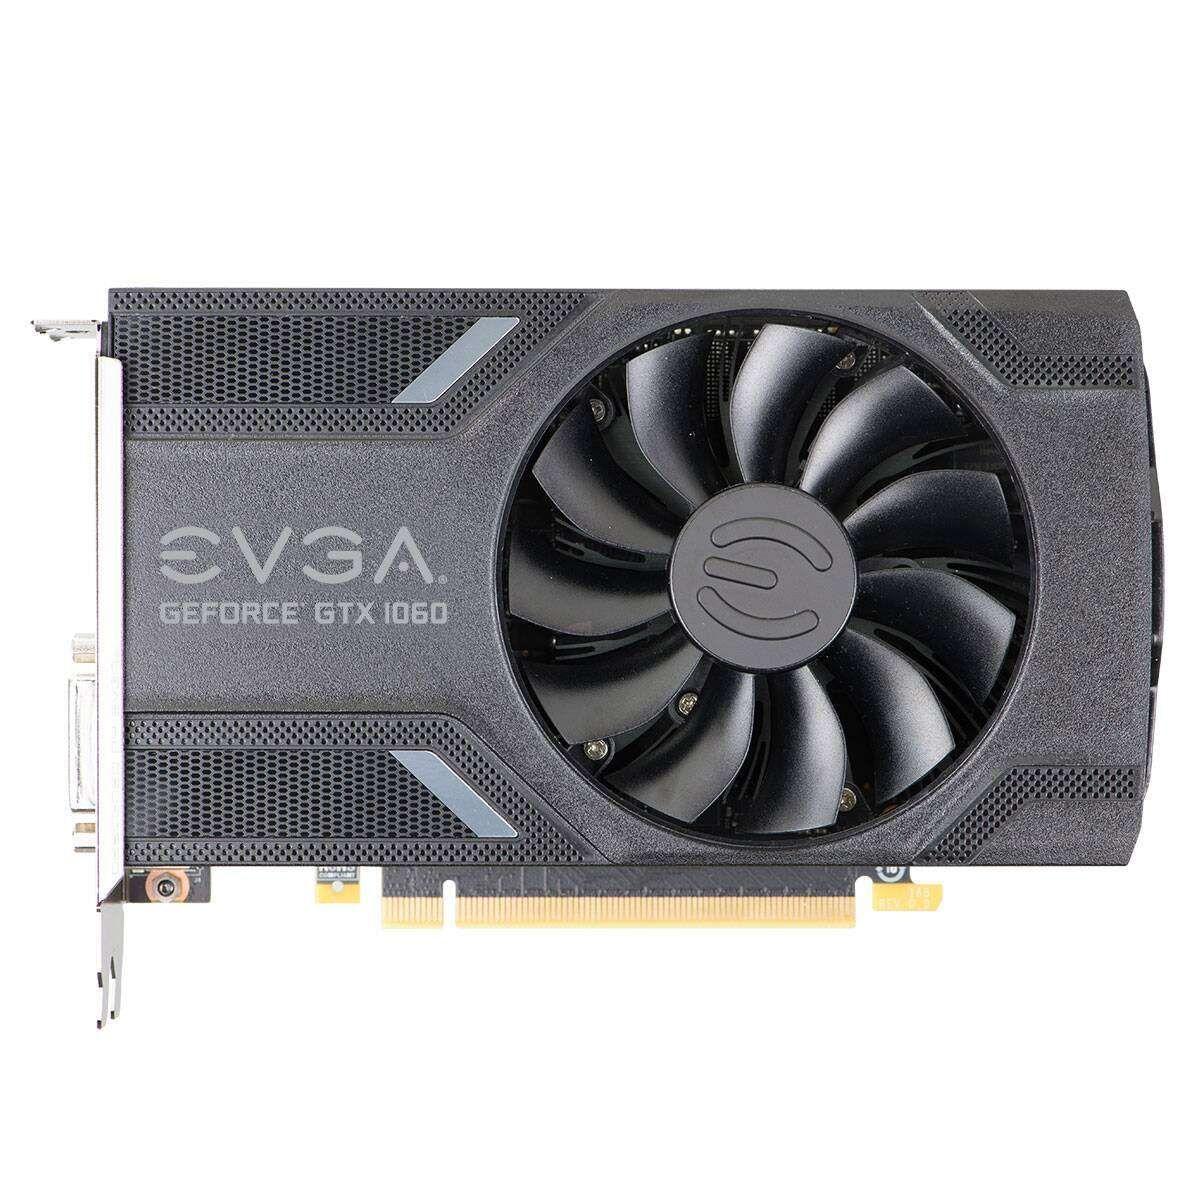 Placa de Vídeo eVGA GeForce GTX 1060 Garming 3GB DDR5 192 Bits - 03G-P4-6160-KR